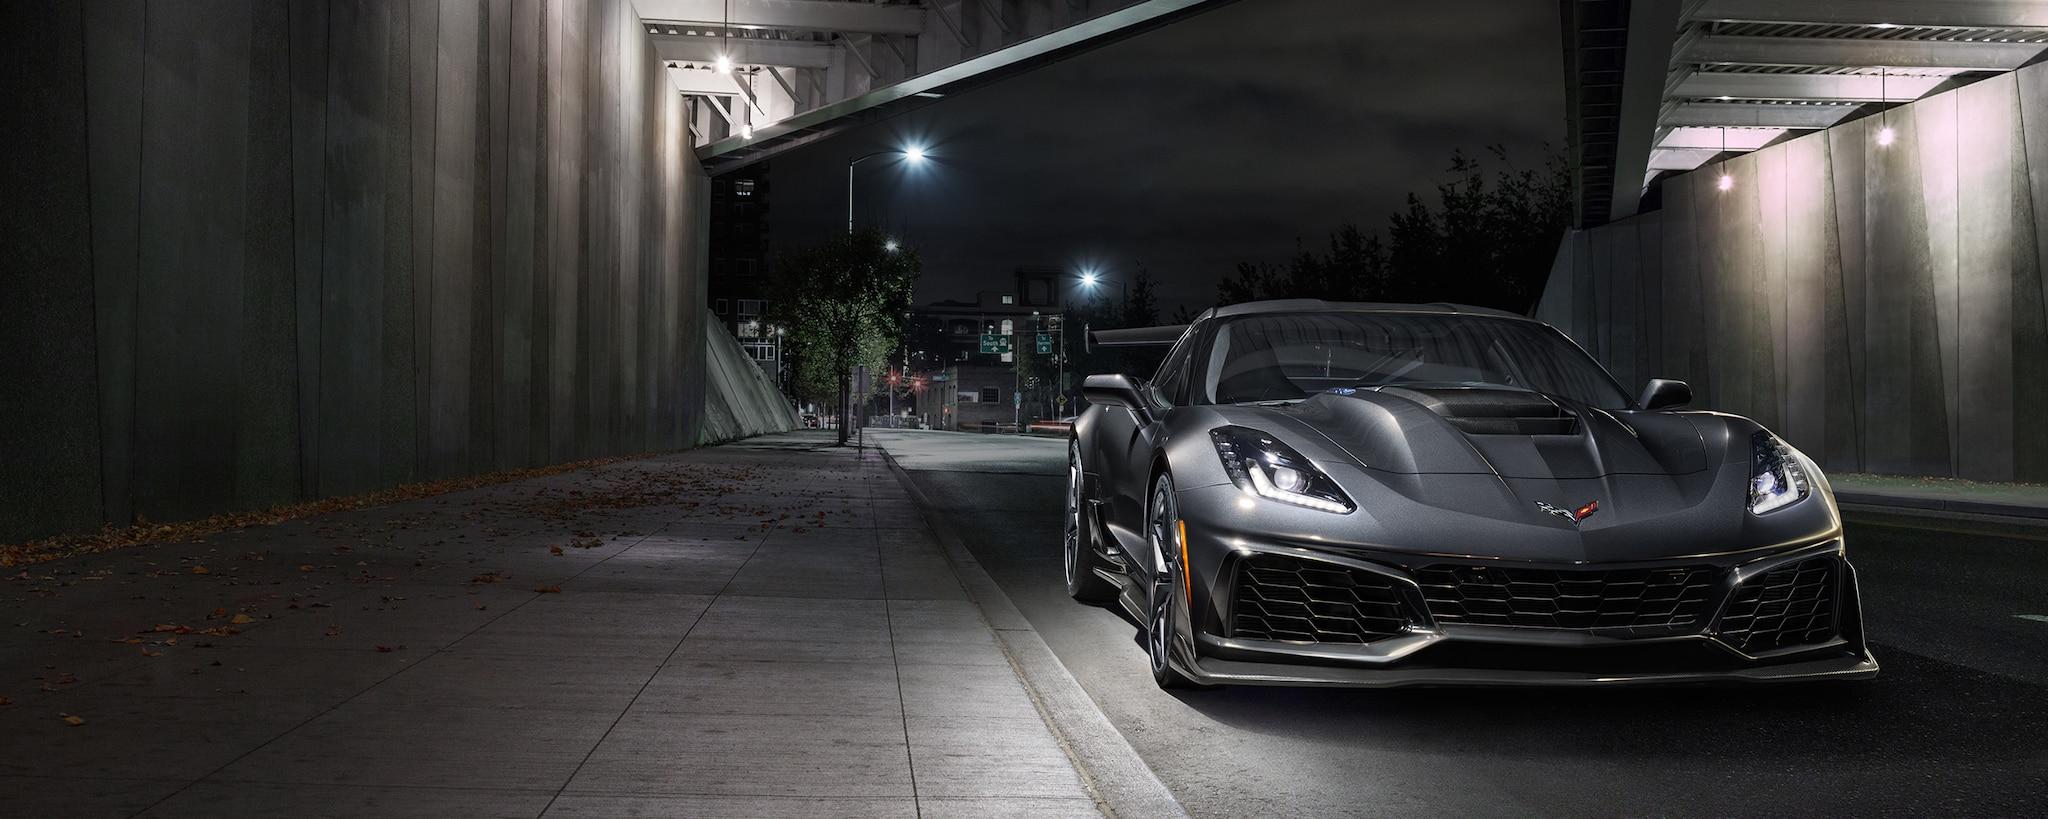 Superauto Corvette ZR1 2019